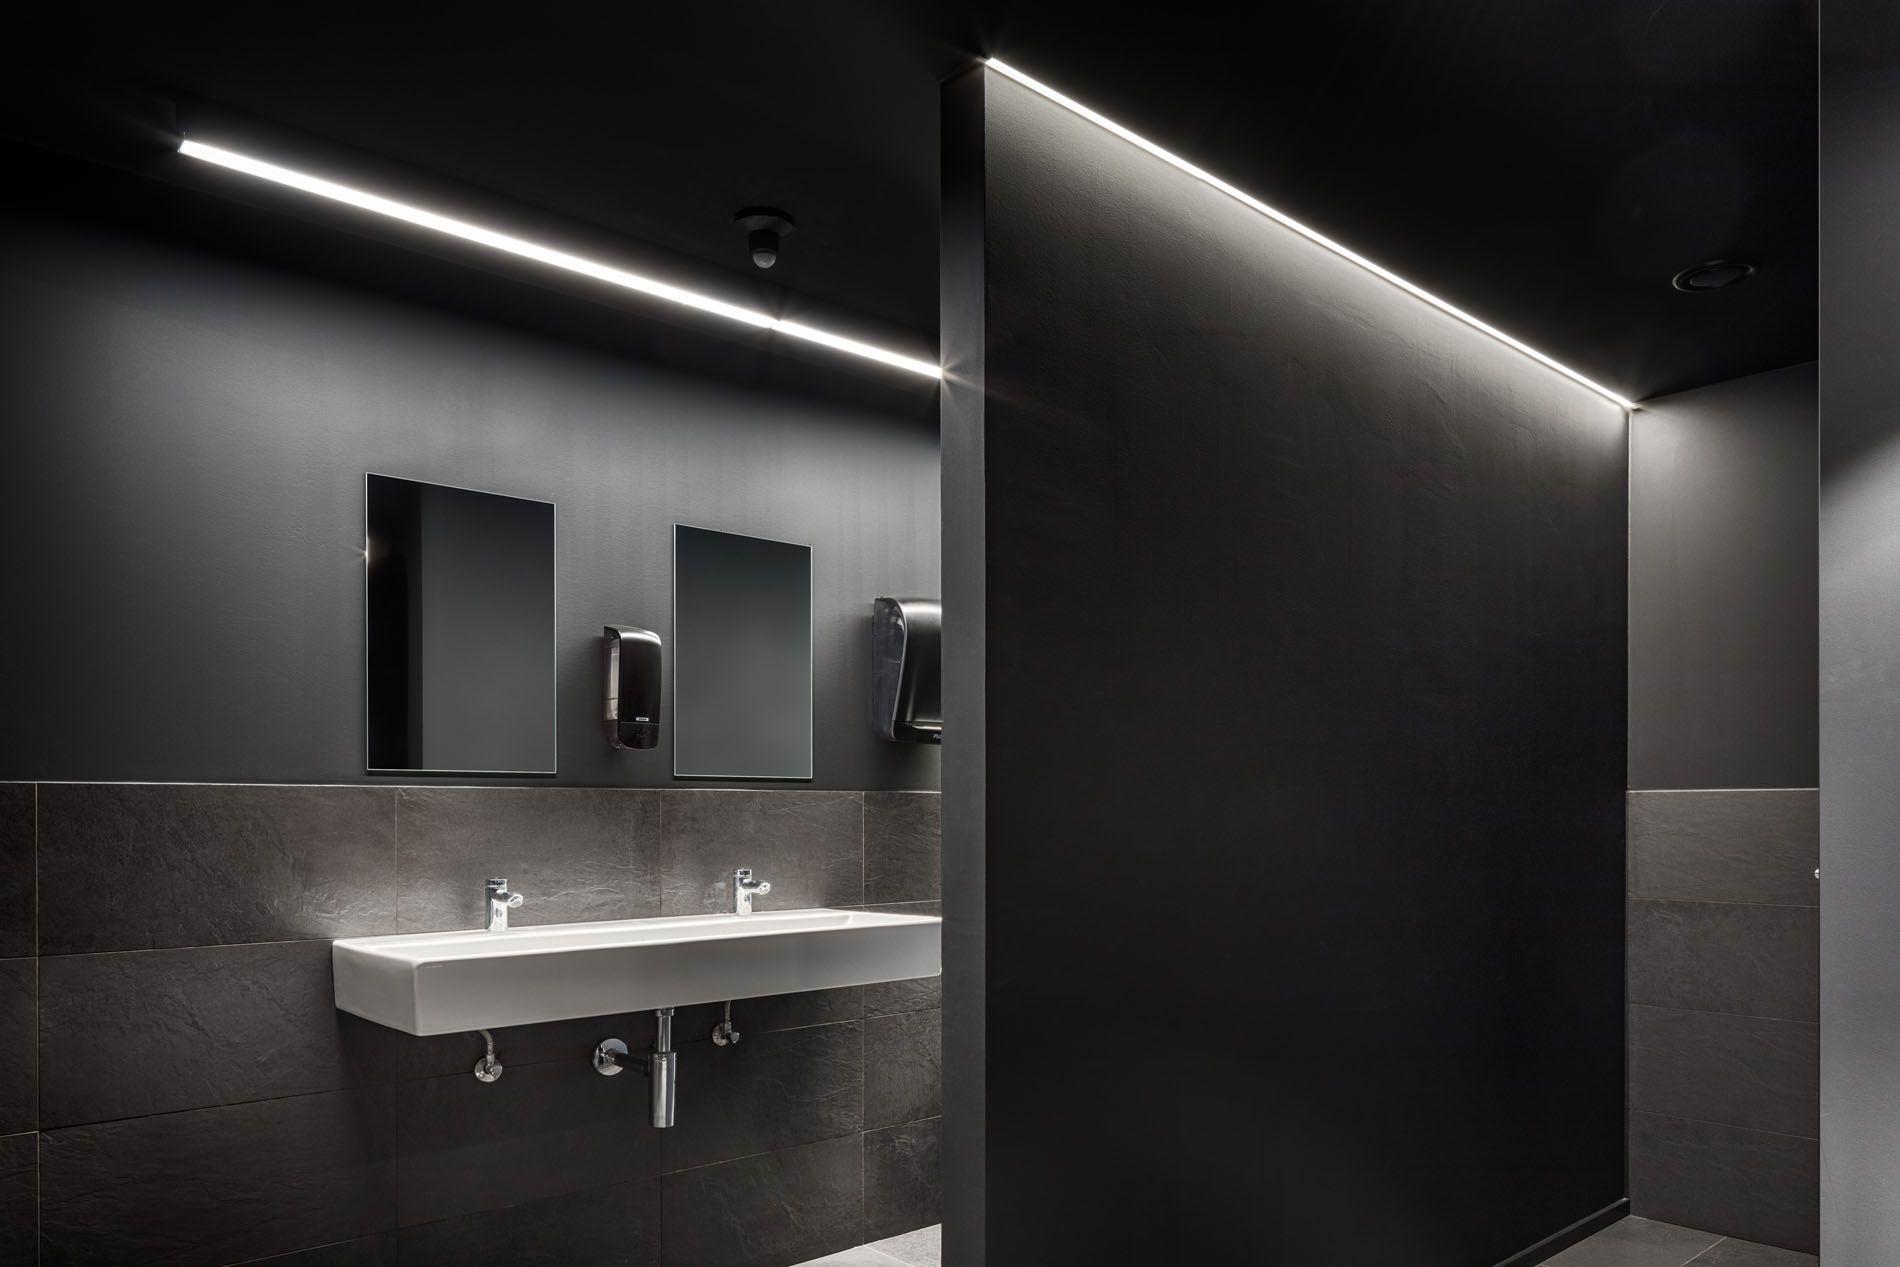 Sld50 Club Brugge Bathroom Lighting Amazing Bathrooms Best Bathroom Lighting